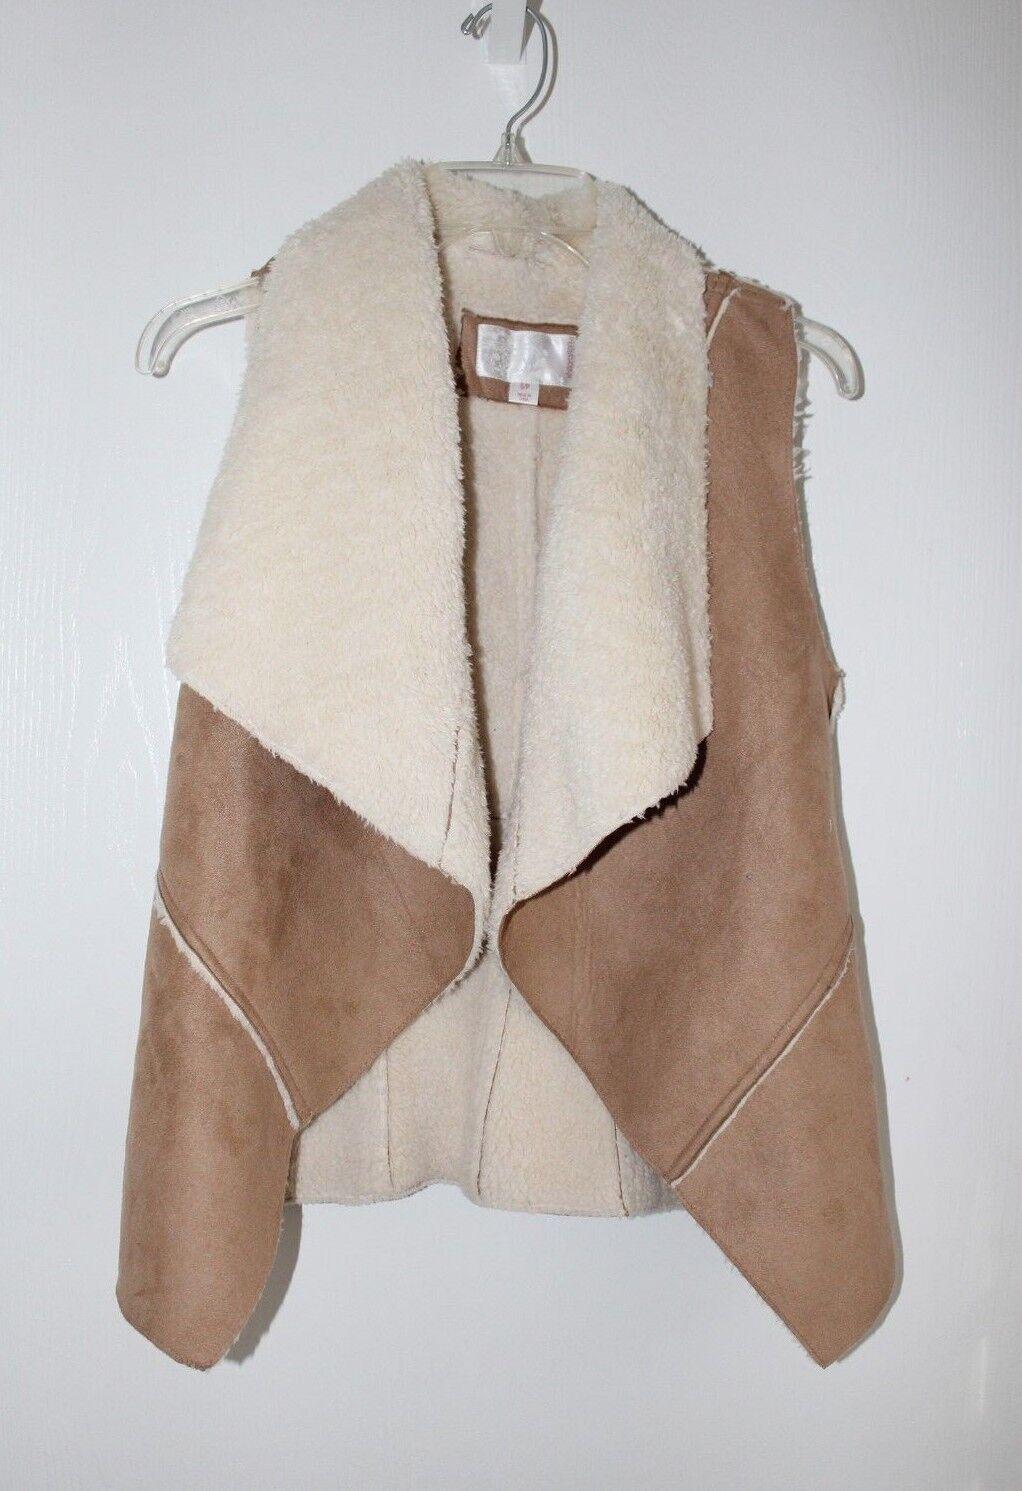 Xhilaration Women's Sz S Faux Suede Shearling Vest Draped Warm Casual Open Front